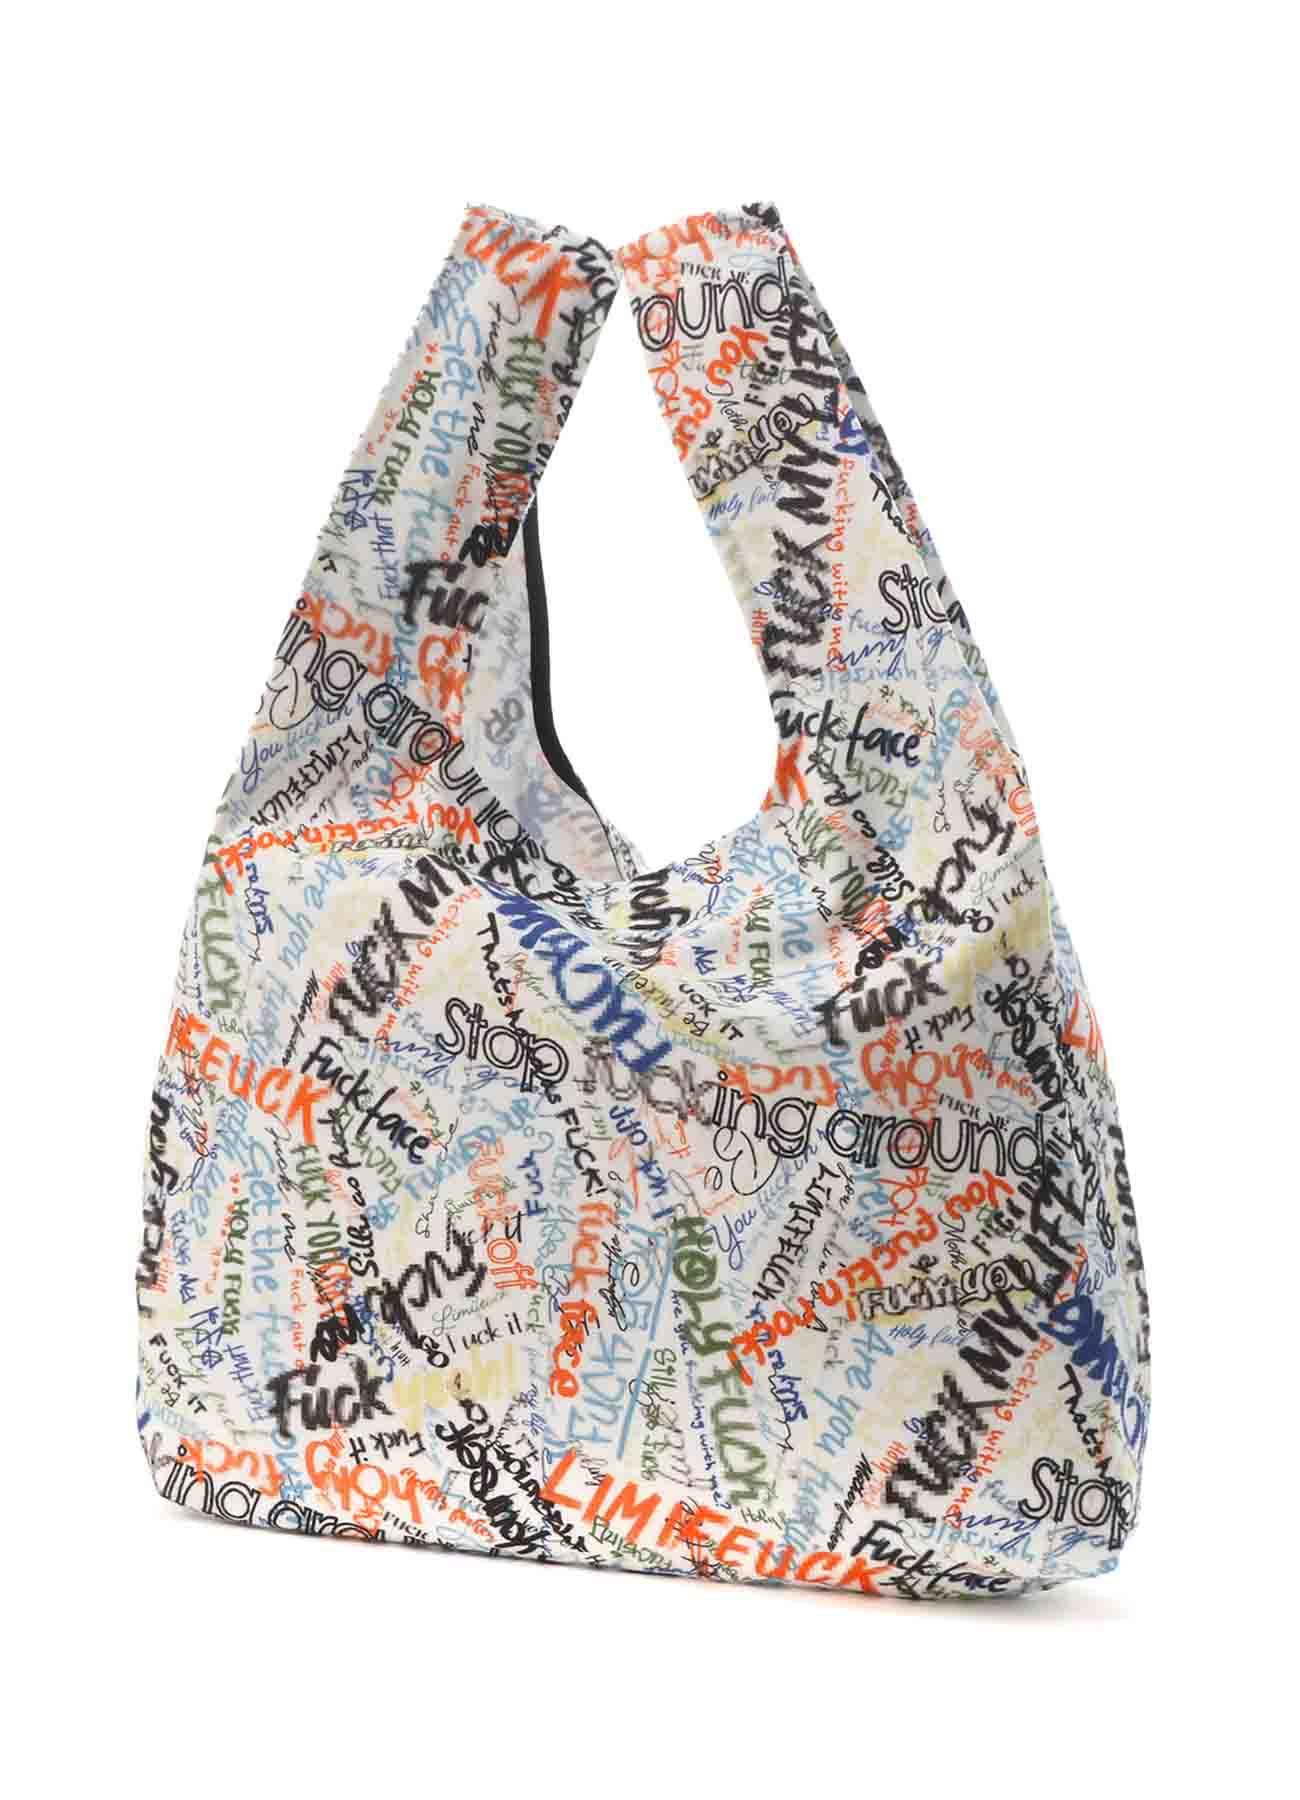 Mosaic FU*K Print Cotton Shopping Bag